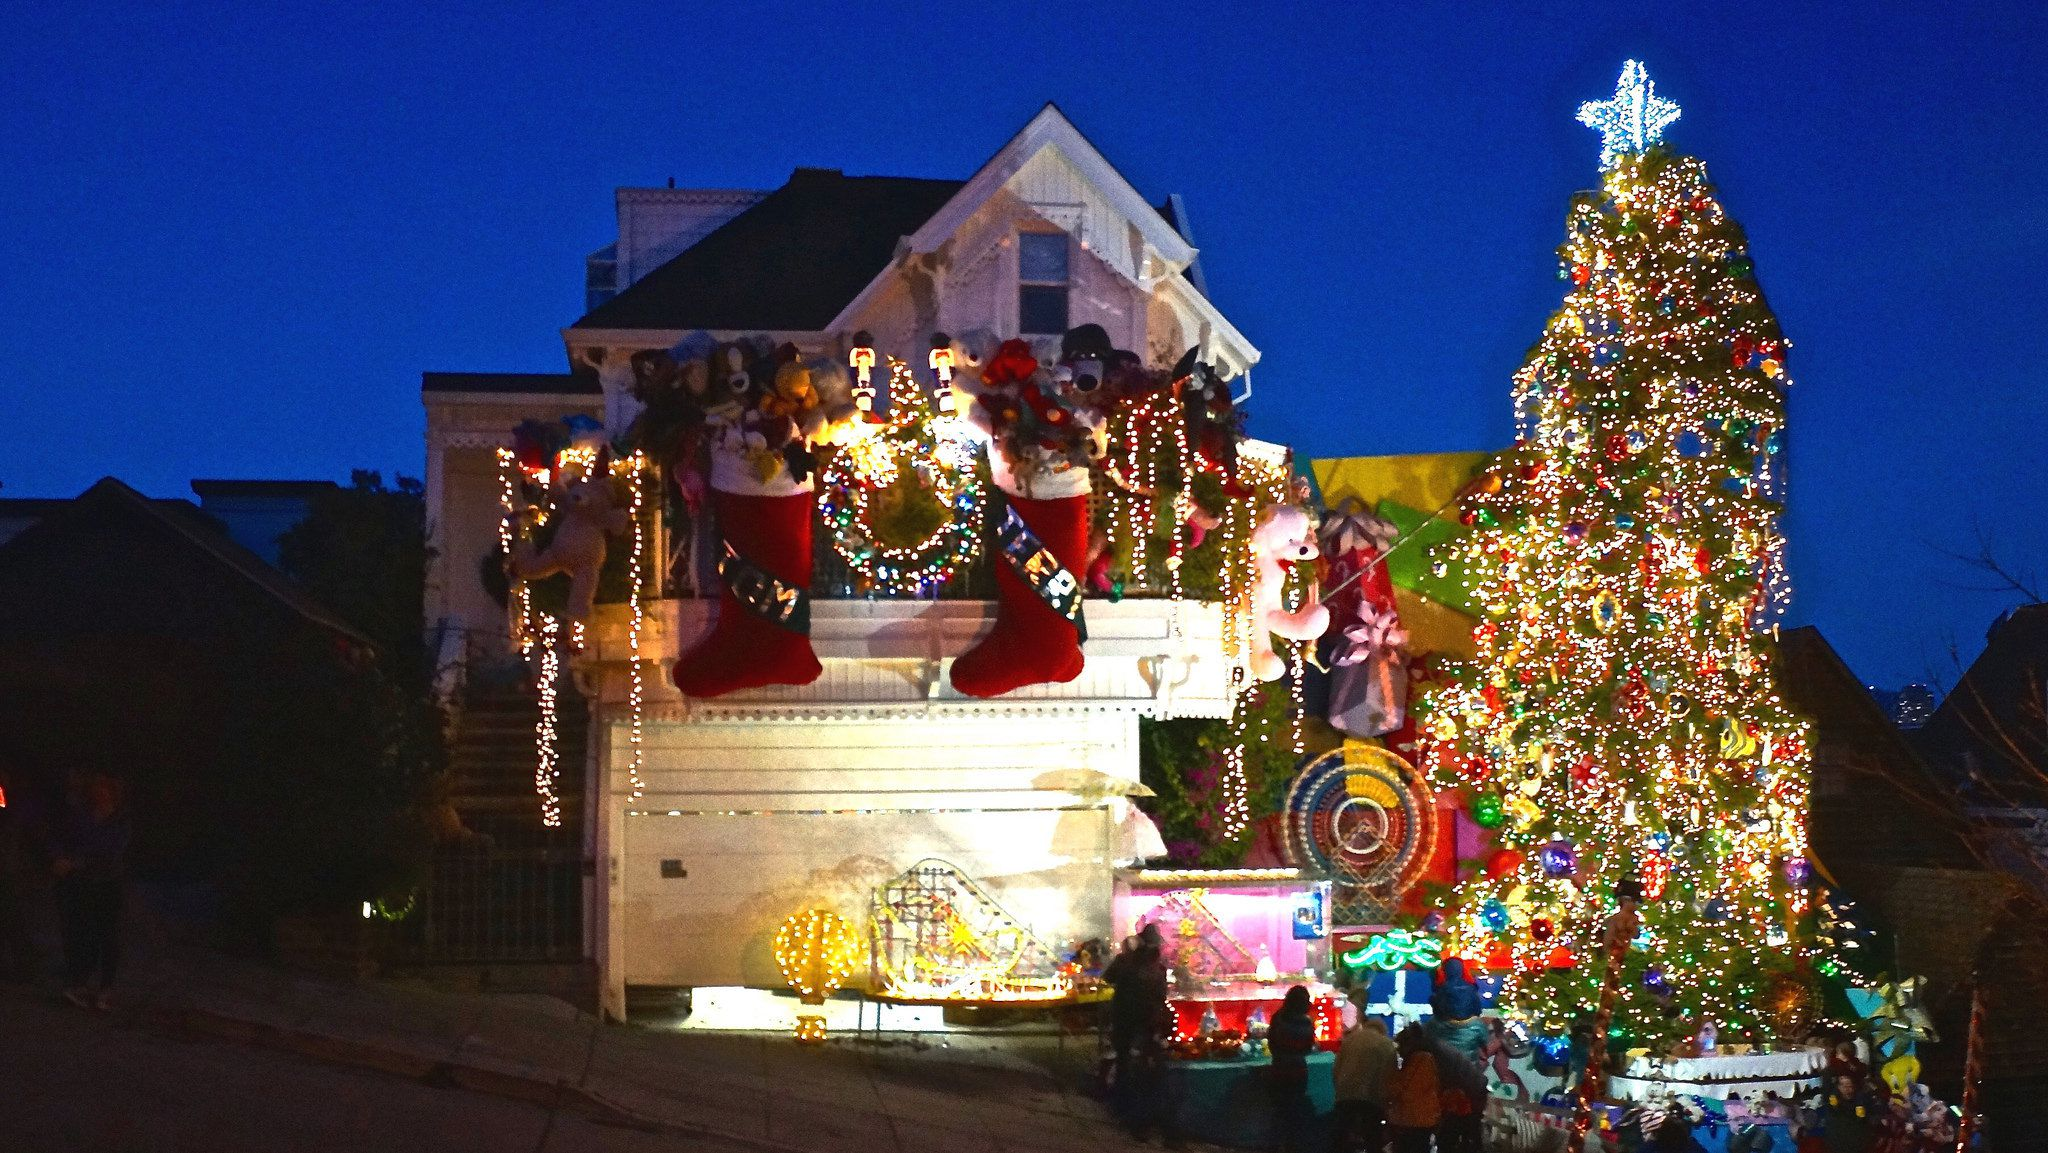 San Francisco Christmas Trees and Holiday Lights